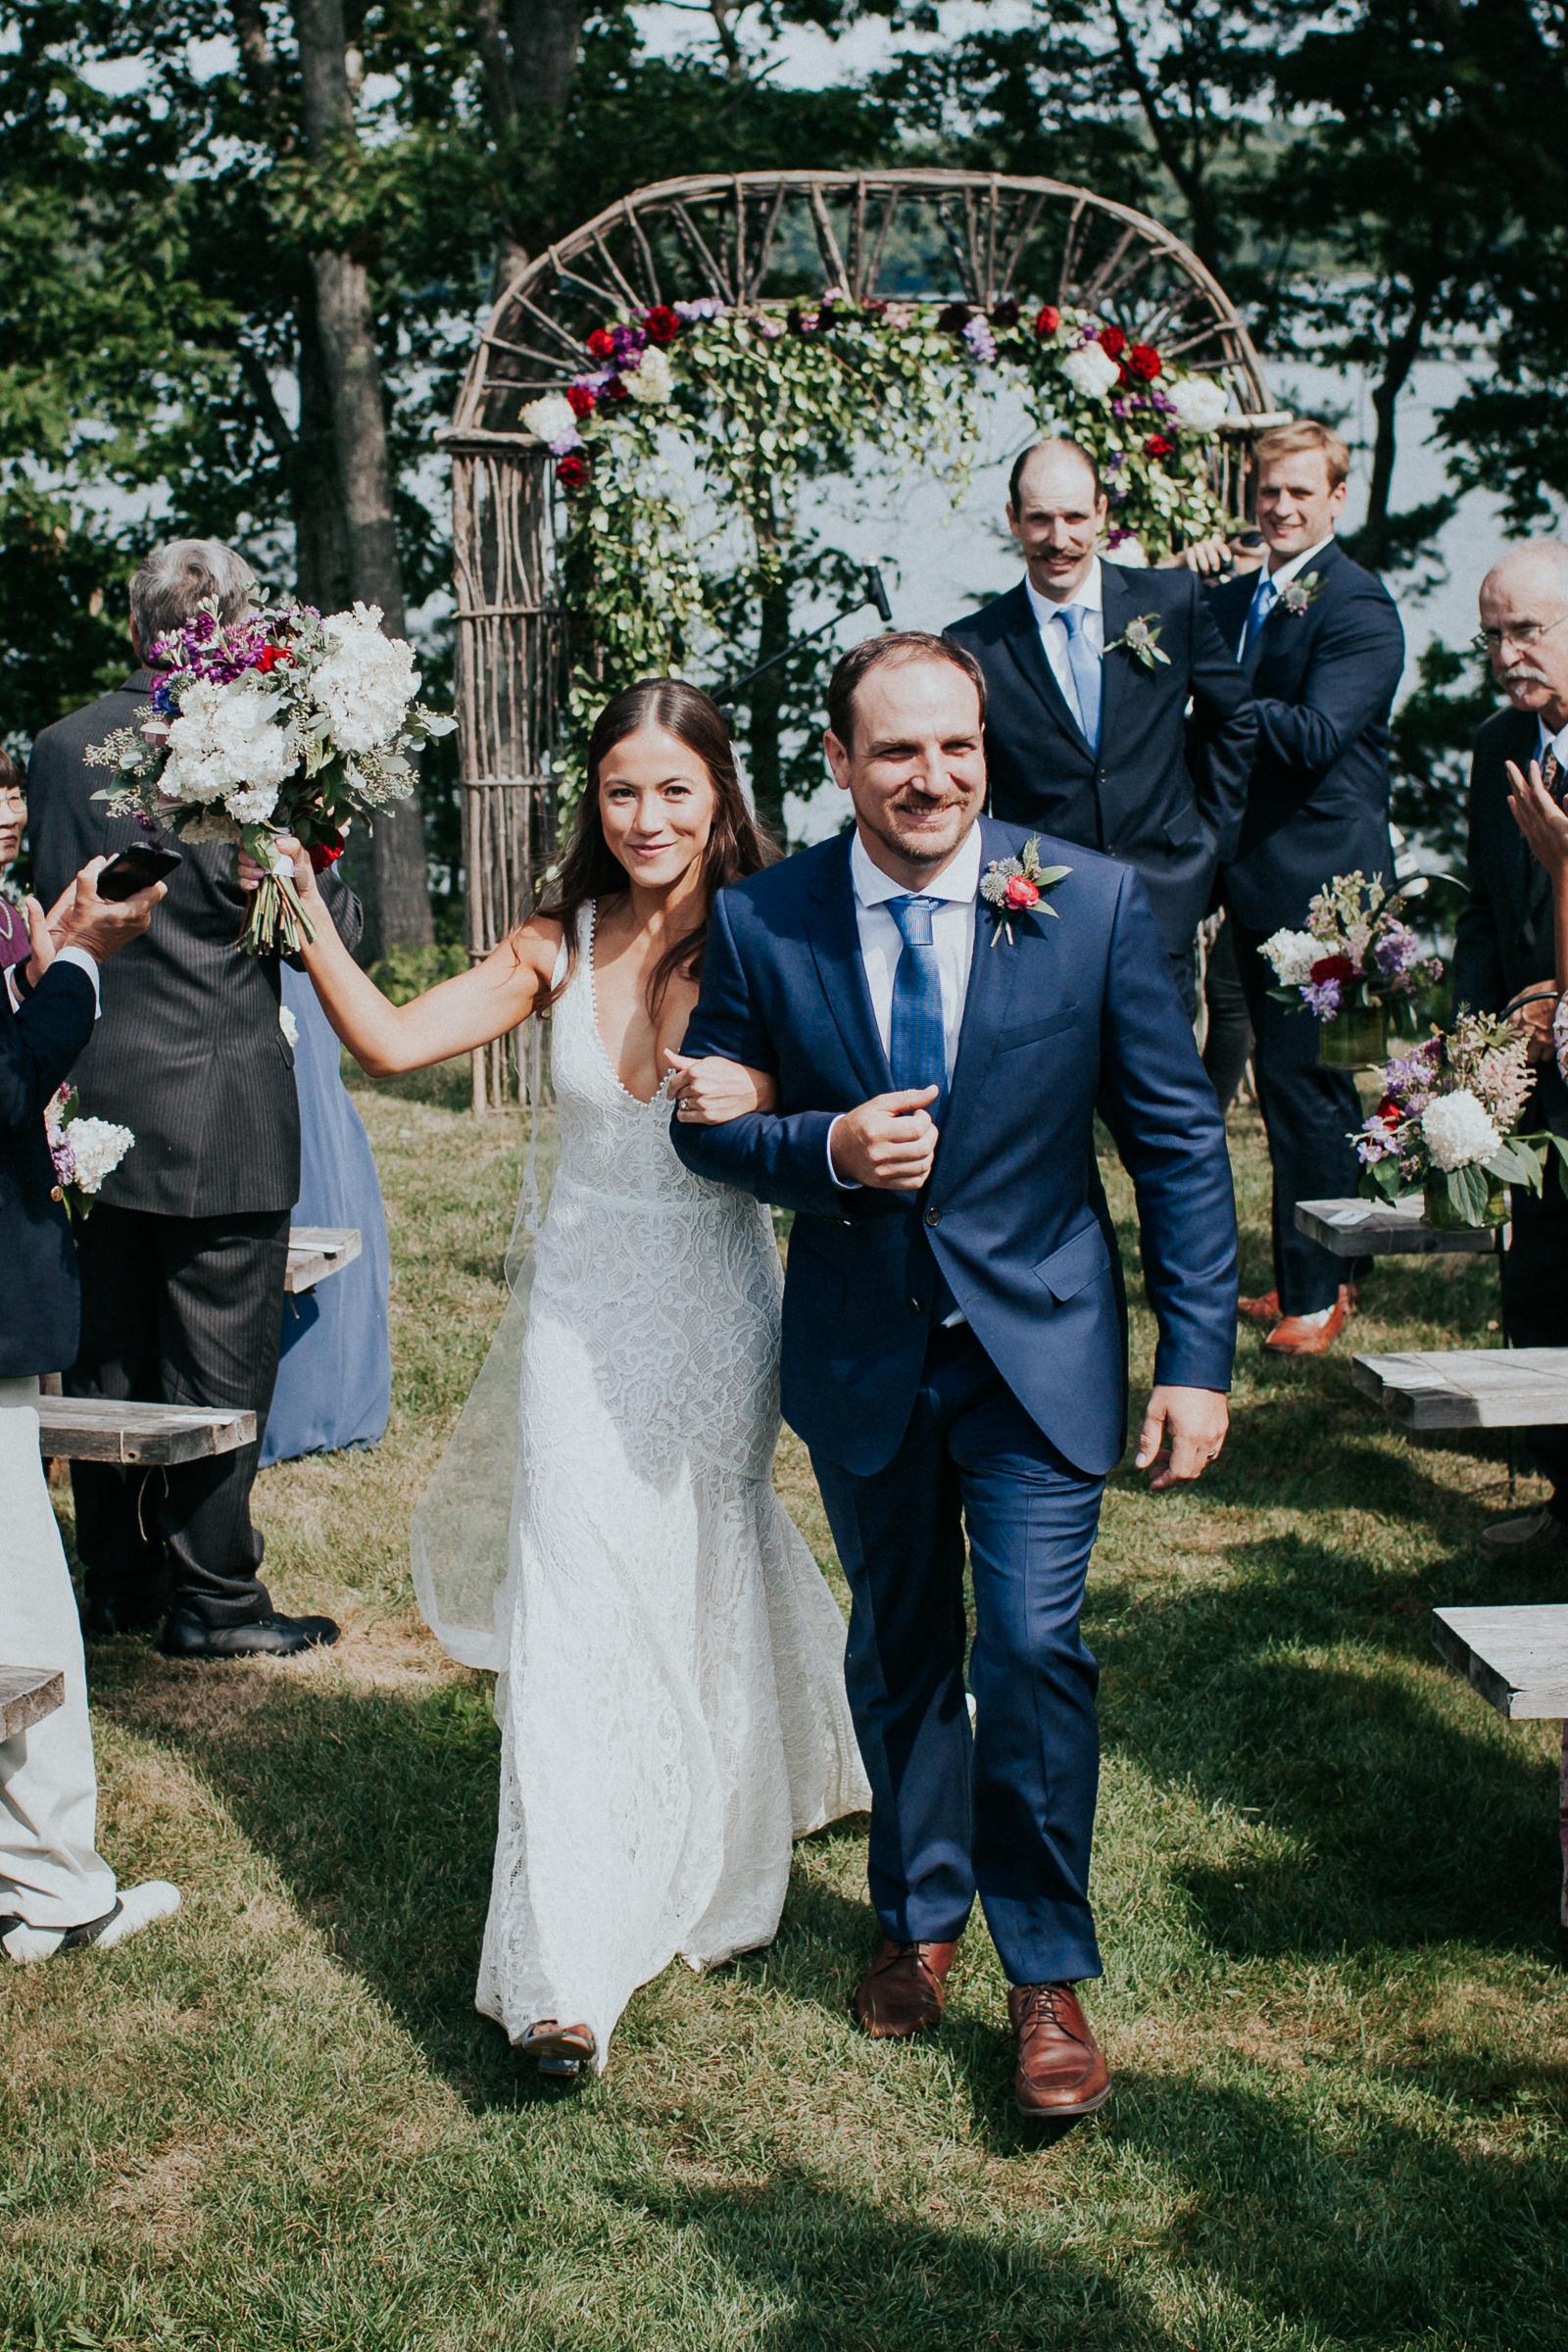 Marianmade-Farm-Wiscasset-Maine-Fine-Art-Documentary-Wedding-Photographer-Elvira-Kalviste-Photography-85.jpg